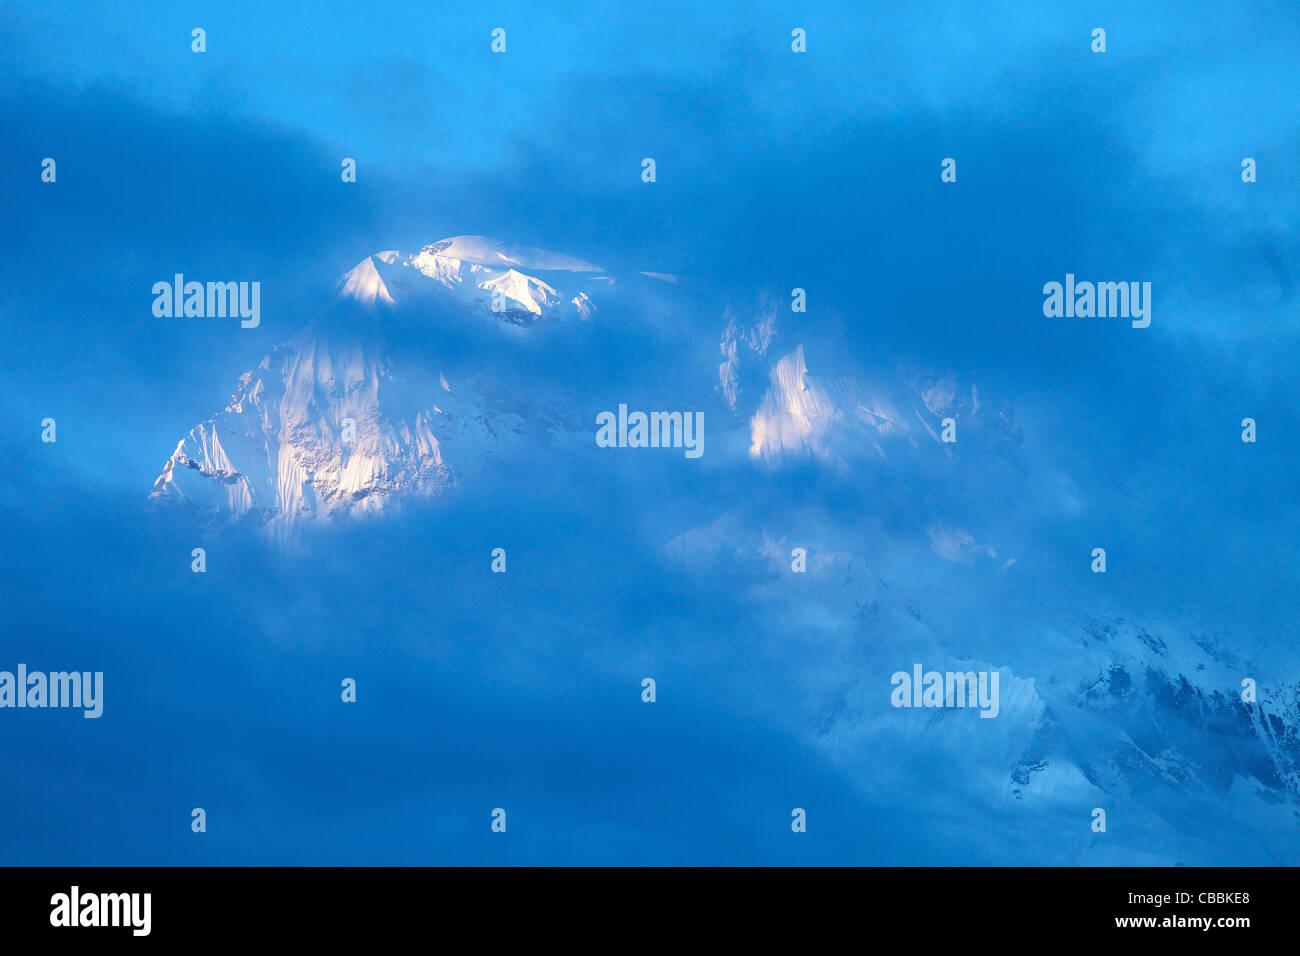 View of summit of Annapurna South from Tadapani, Annapurna Sanctuary Region, Himalayas, Nepal, Asia - Stock Image